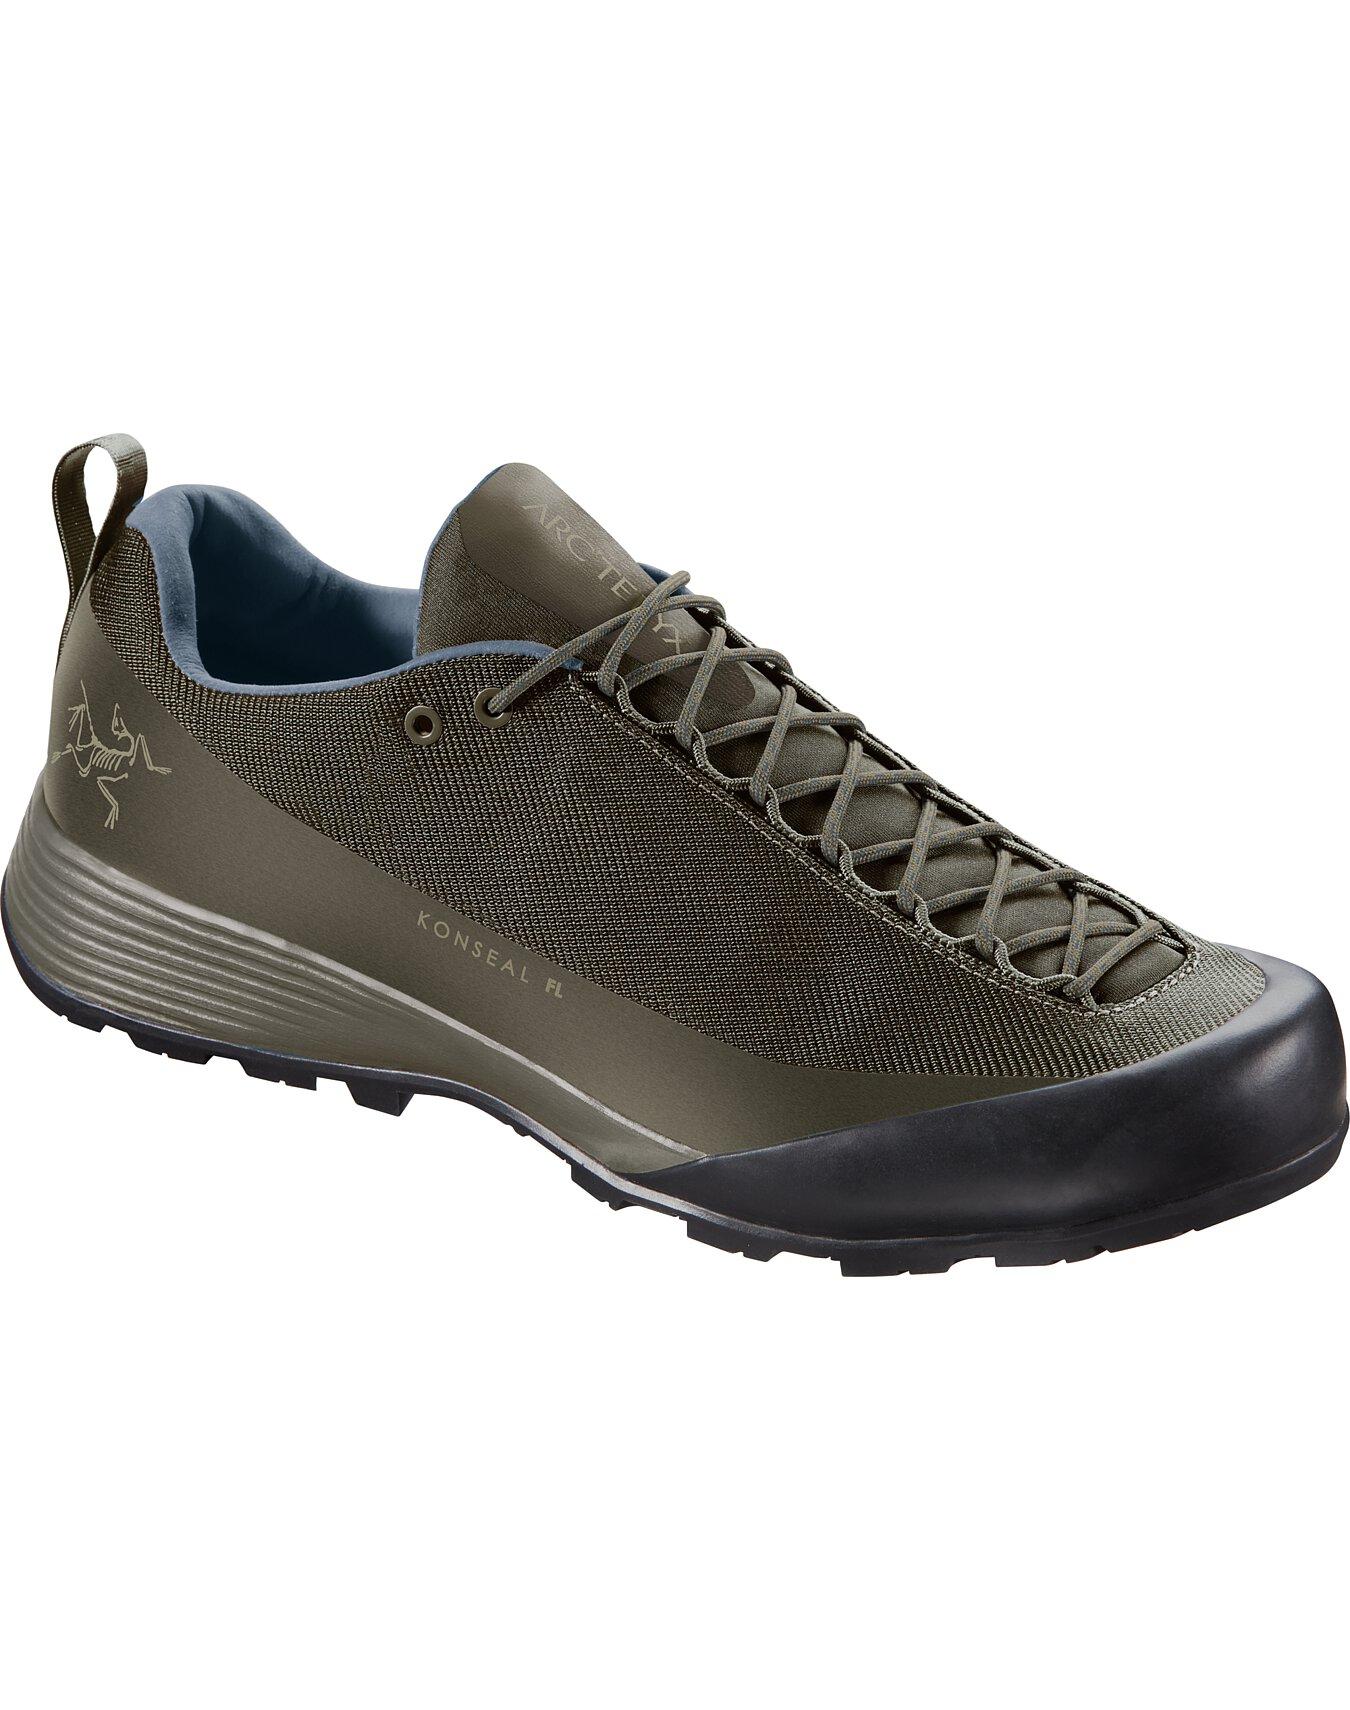 Konseal FL 2 GTX Shoe Men's